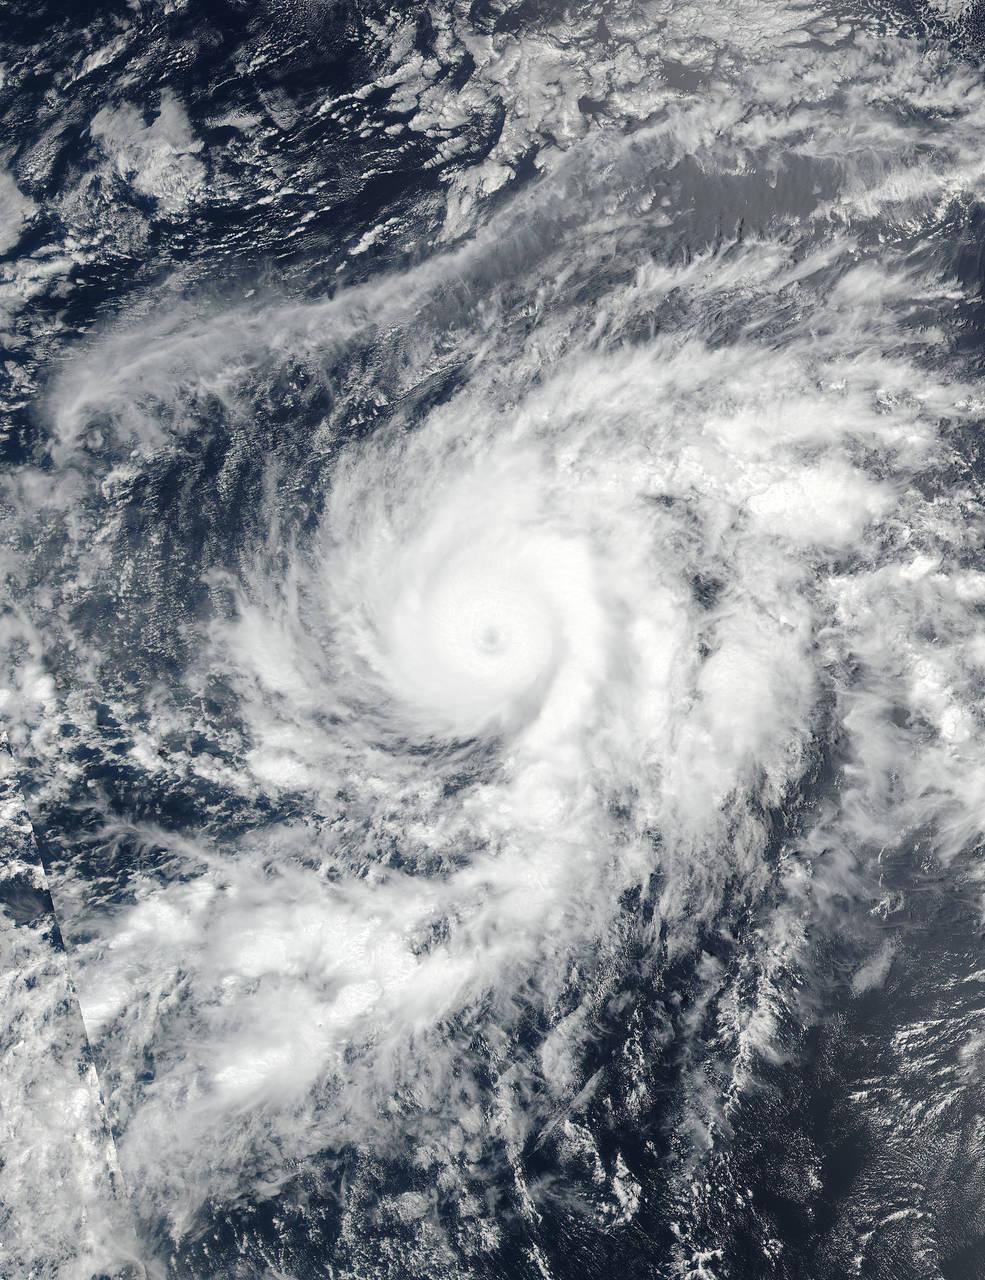 satellite view of hurricane over ocean